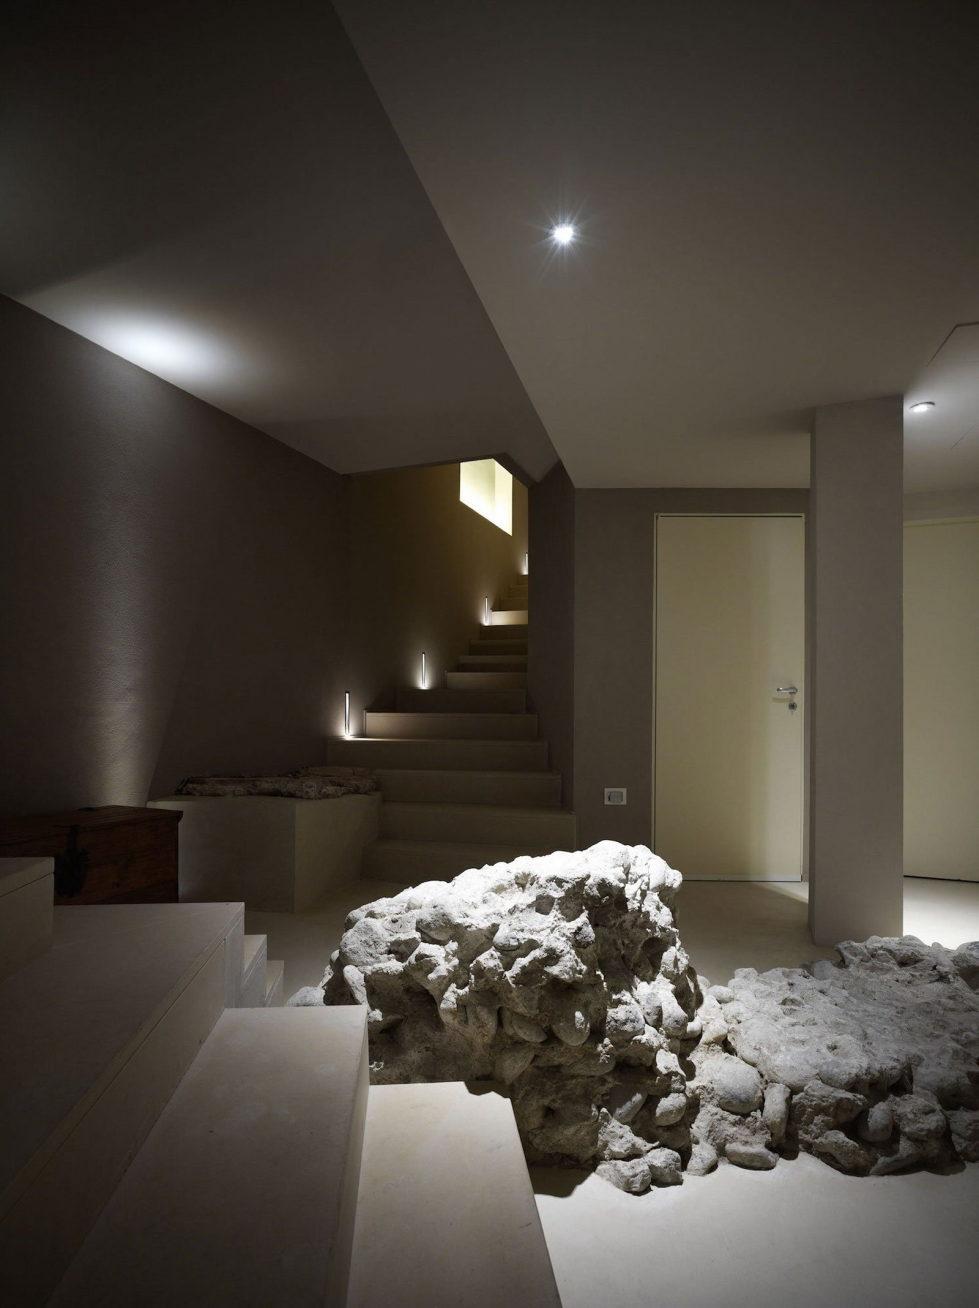 Three-level Apartments In Milan From Arassociati Architetti 22